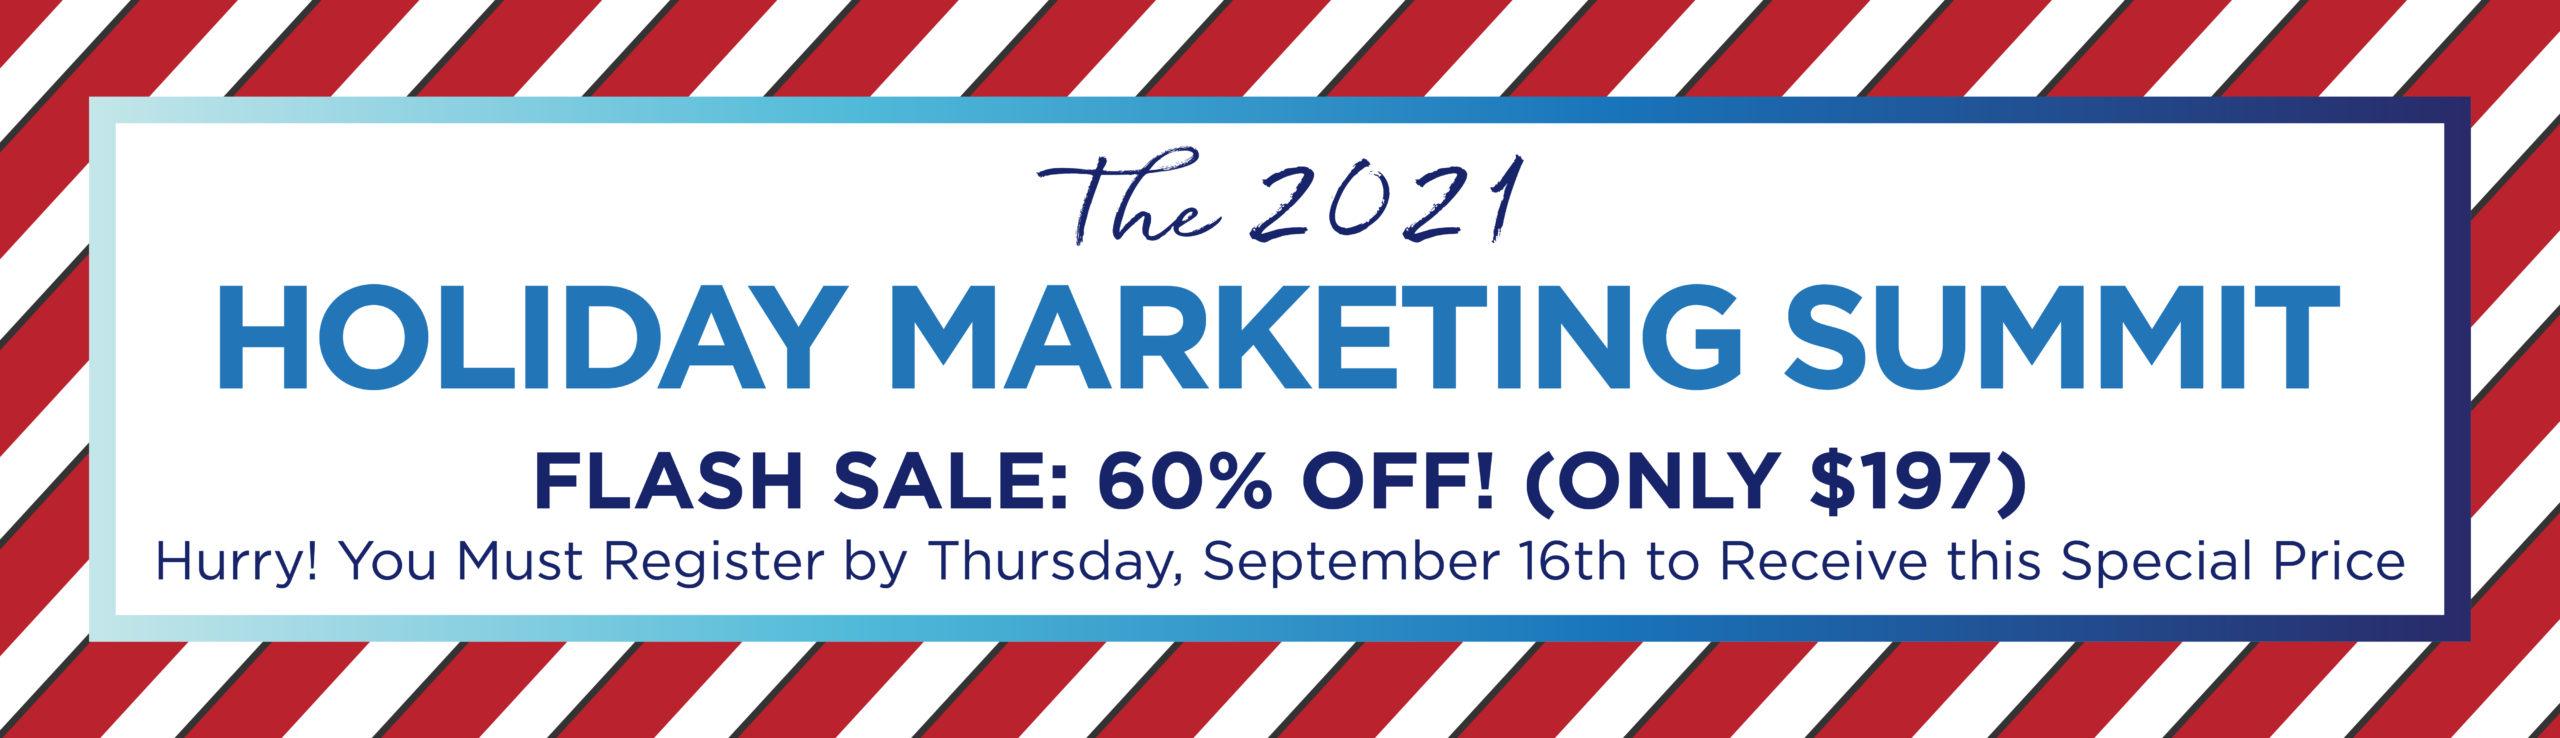 Holiday Marketing Summit Banner Flash Sale 2-01